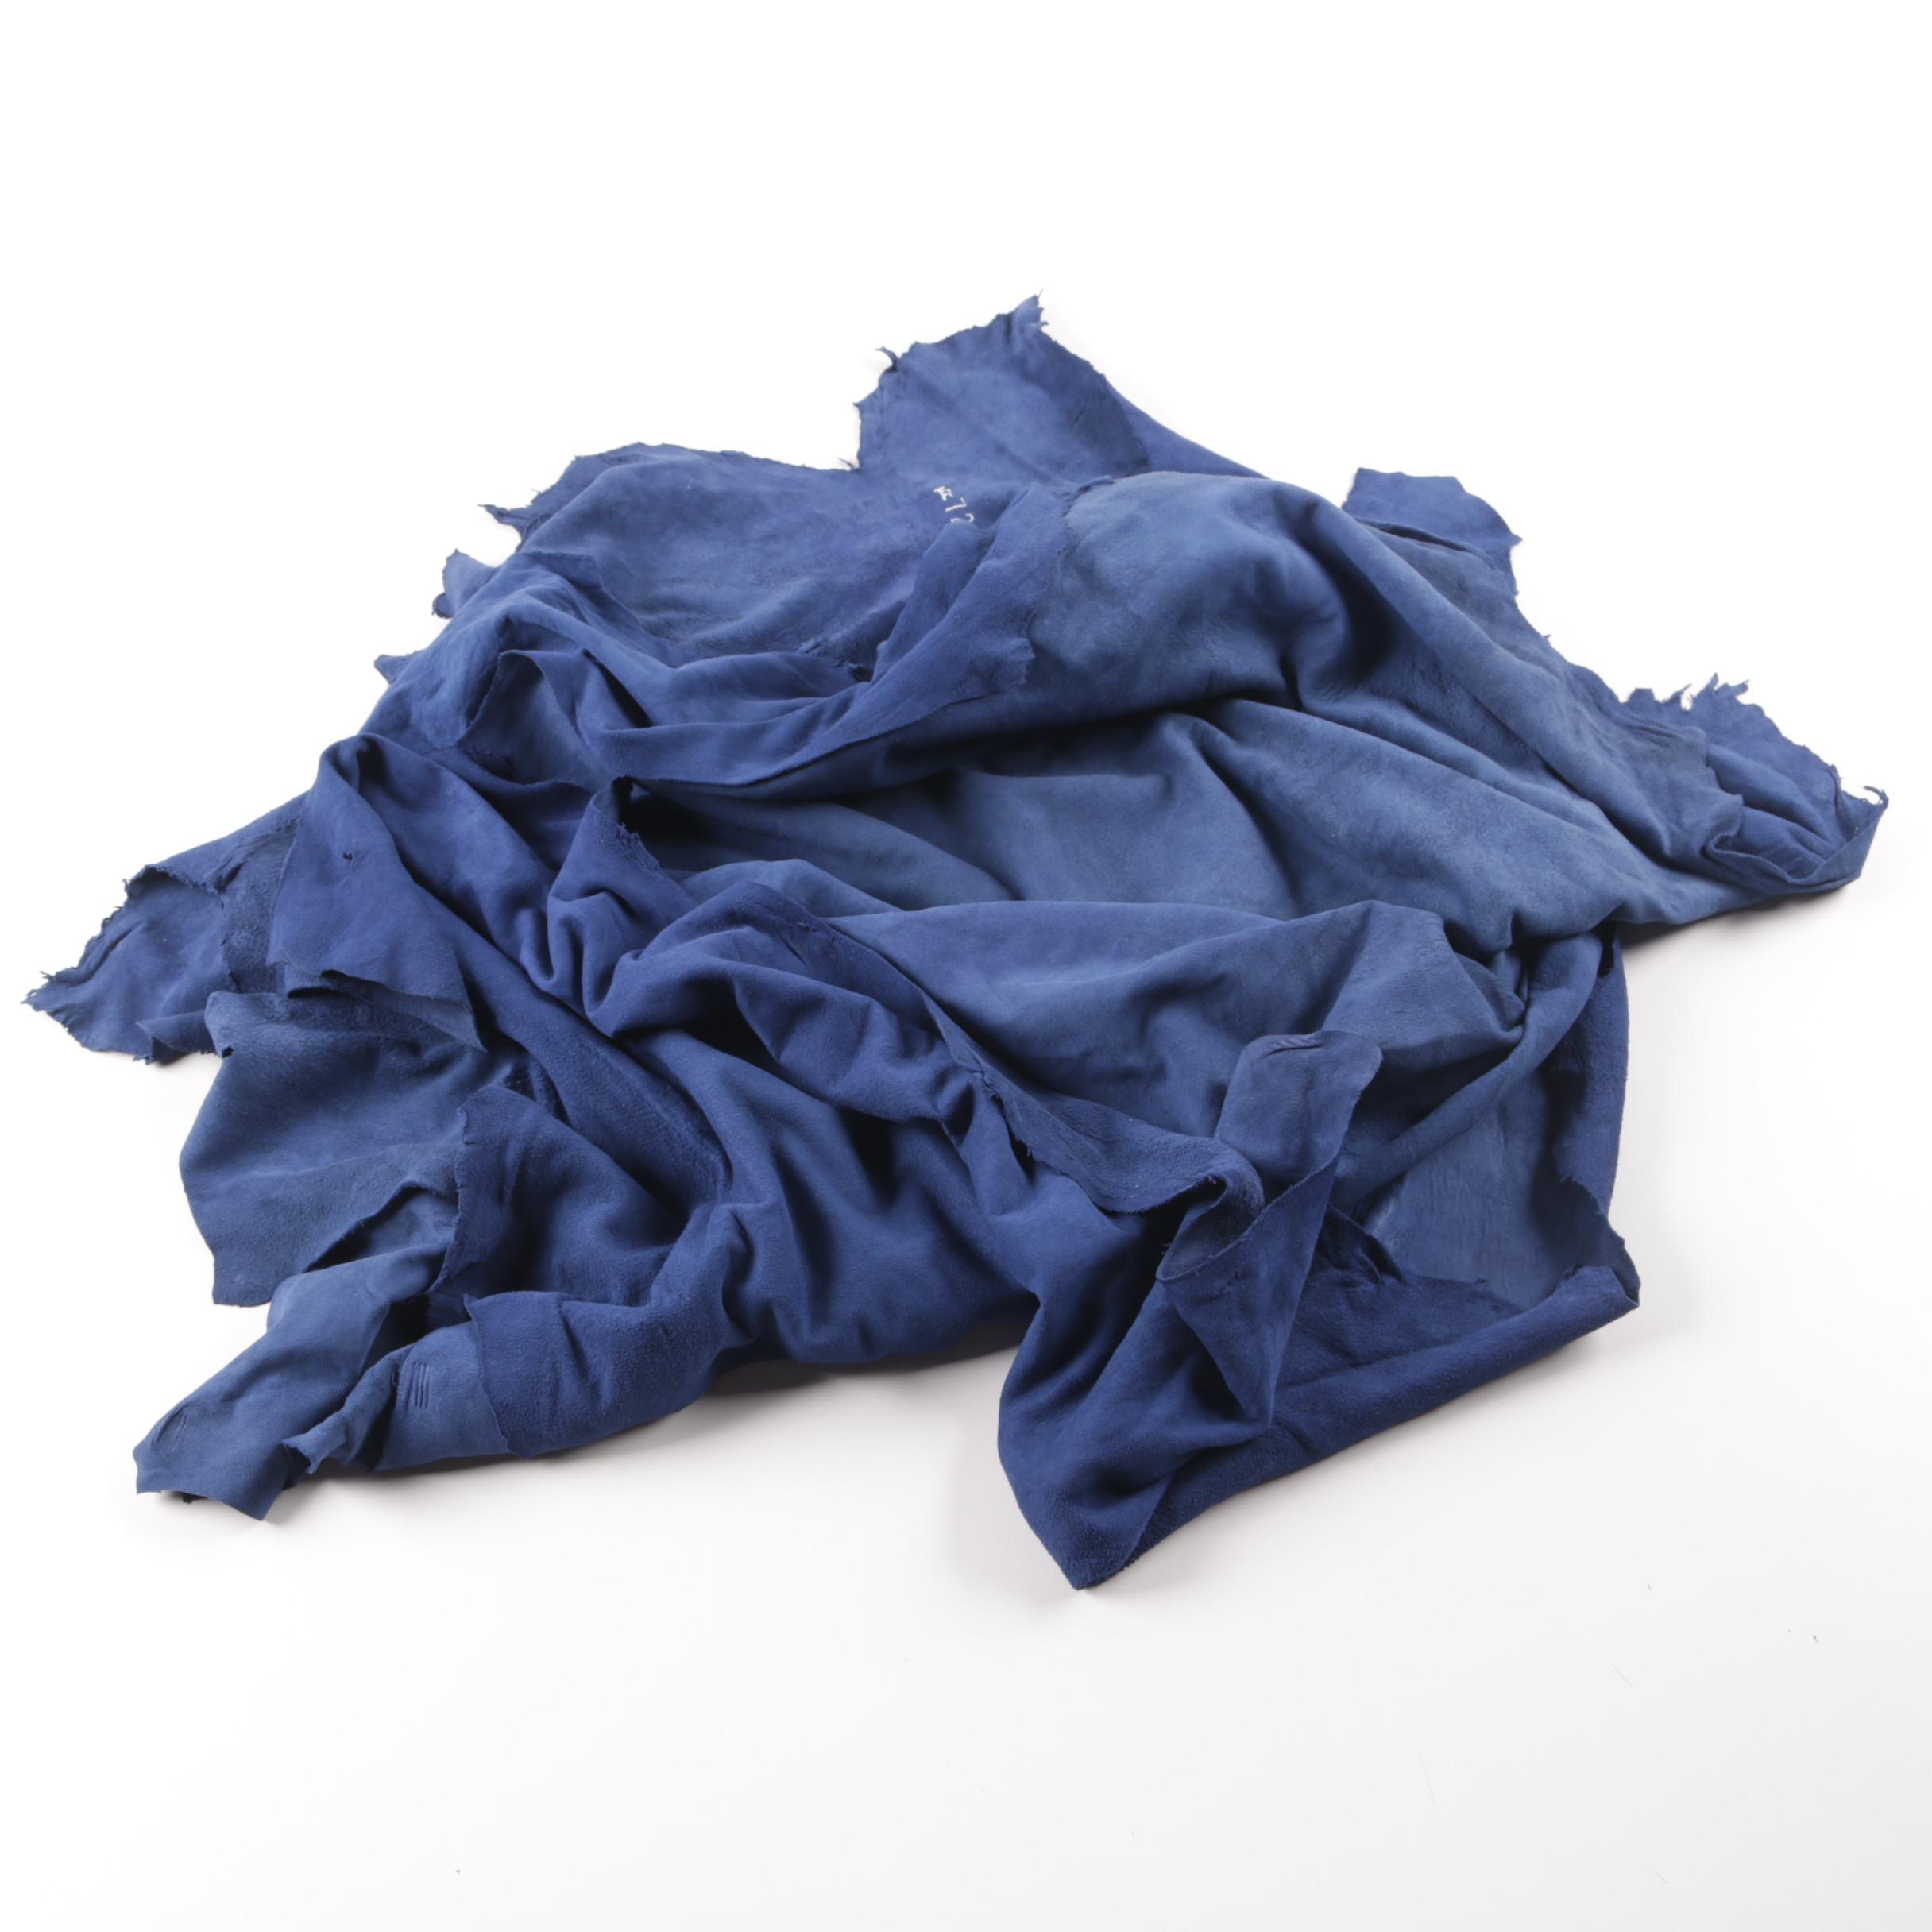 Blue Leather Hides